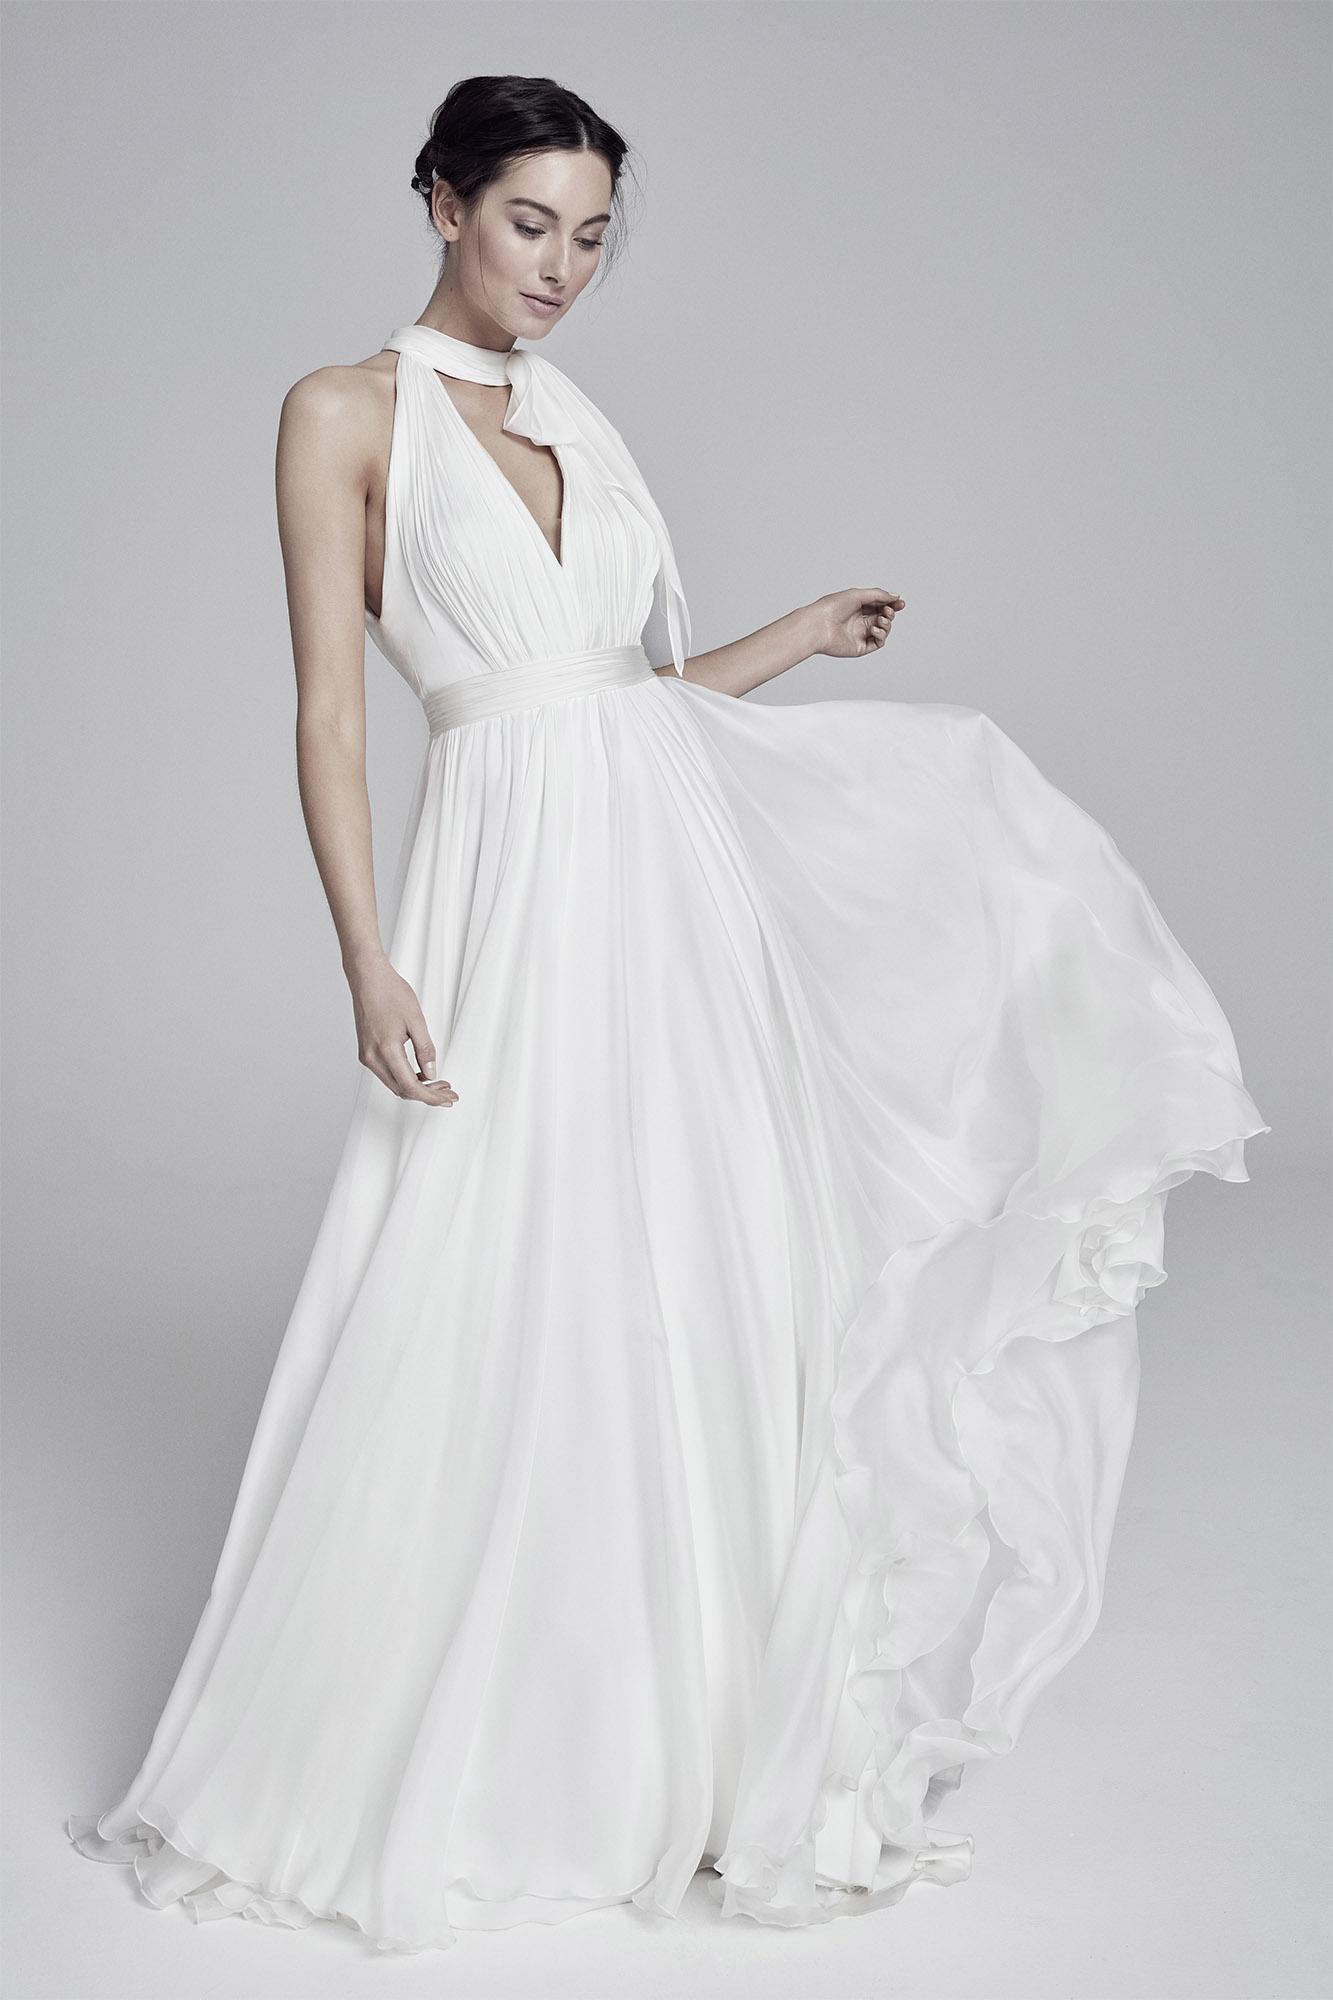 Elsa | Lookbook Collection 2019 | designer wedding dresses by Suzanne Neville